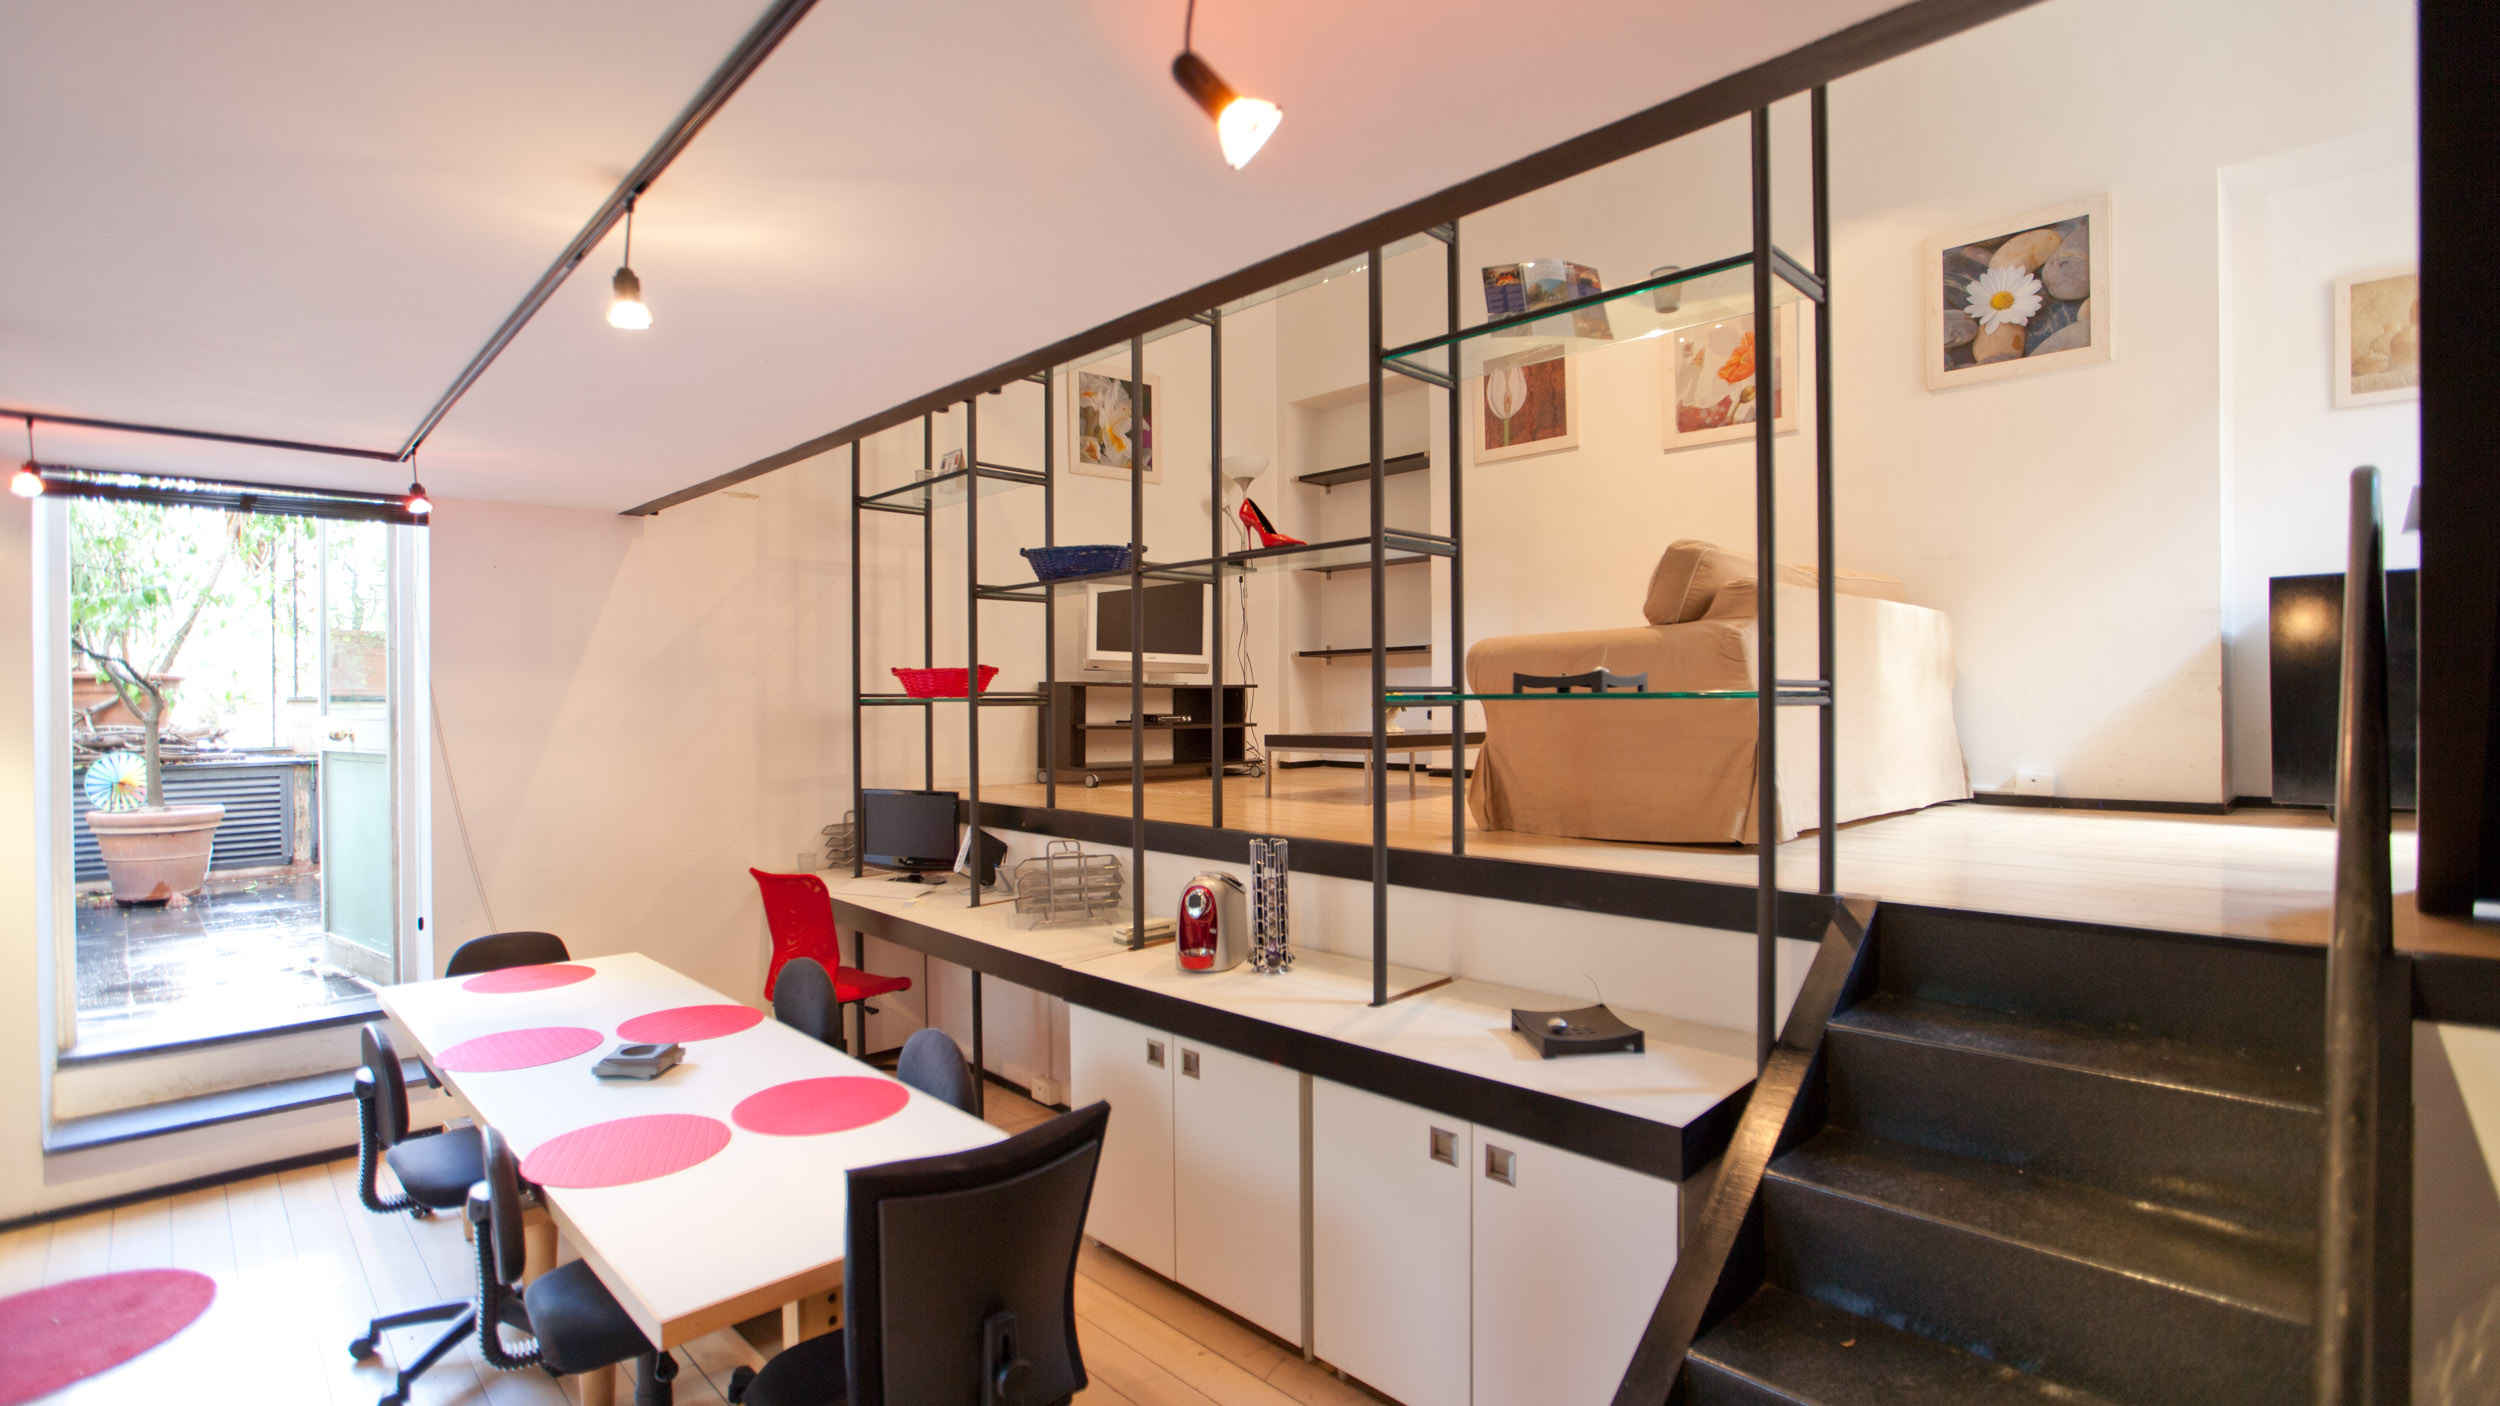 1 Bed Short Term Rental Apartment Trastevere area